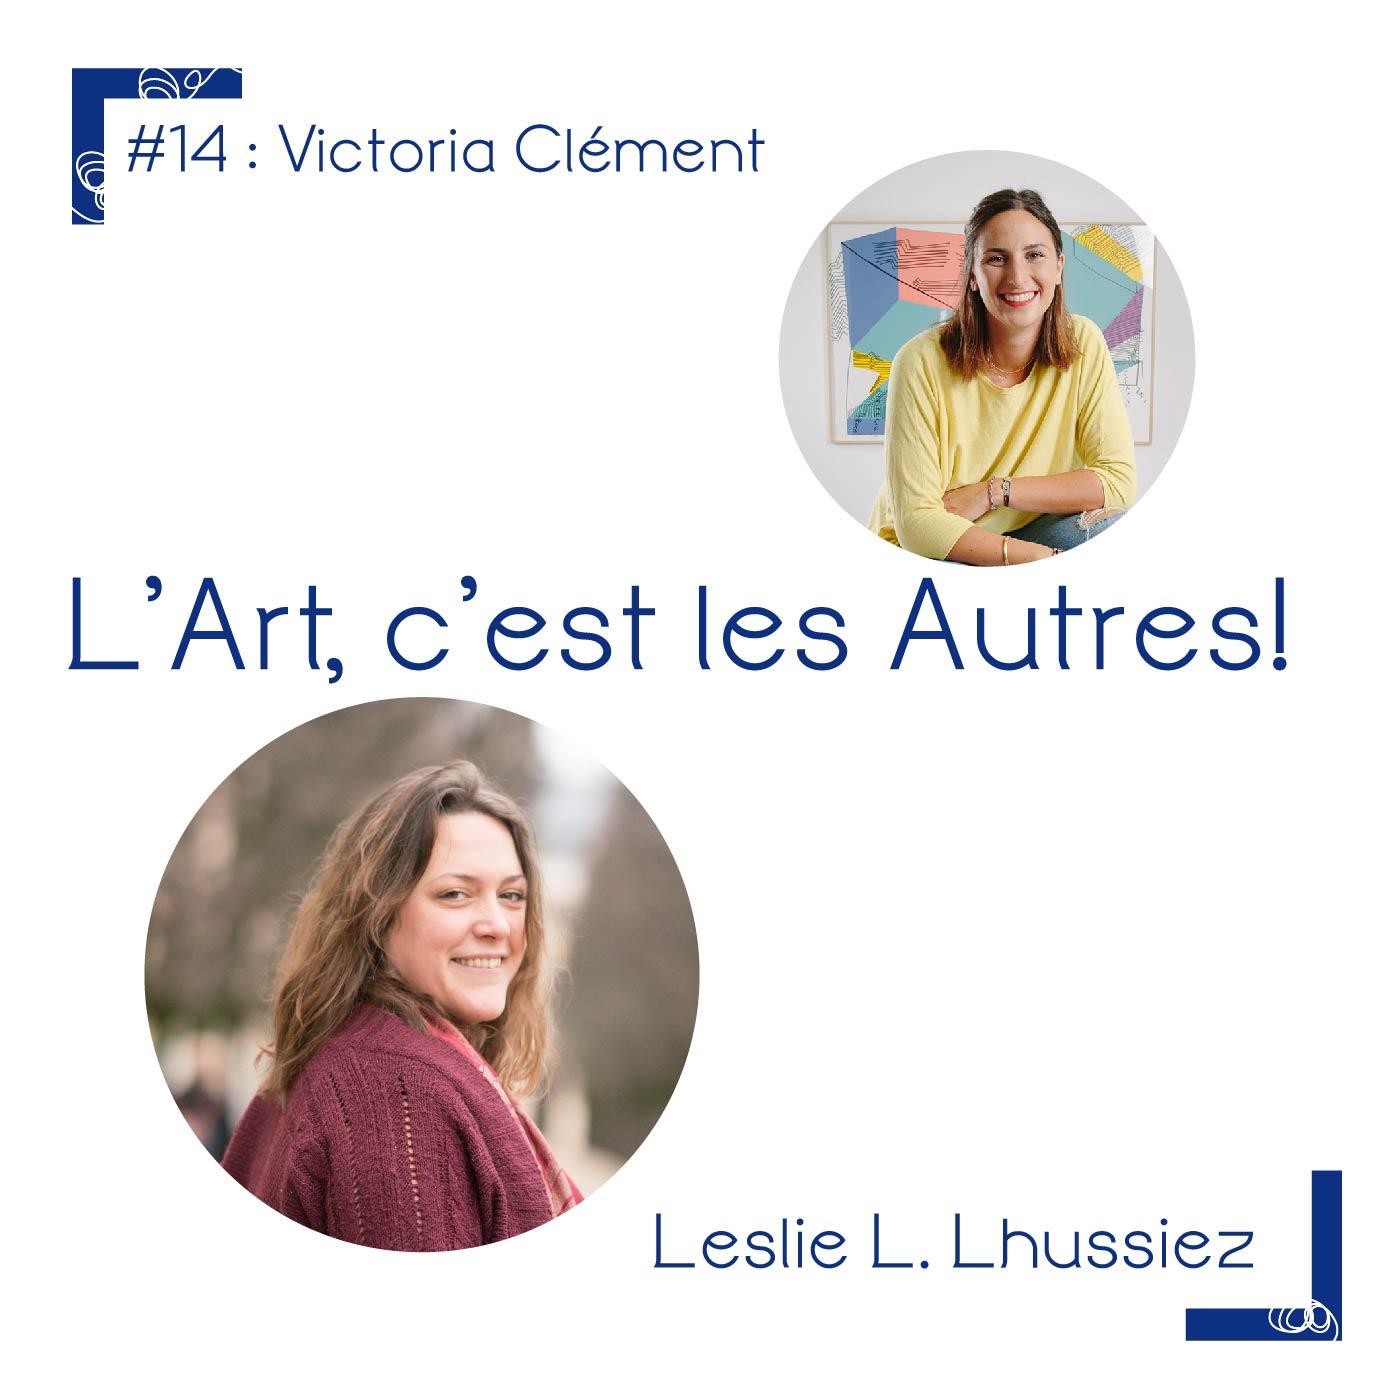 # 14 Victoria Clément. Galeriste ludique 2.0